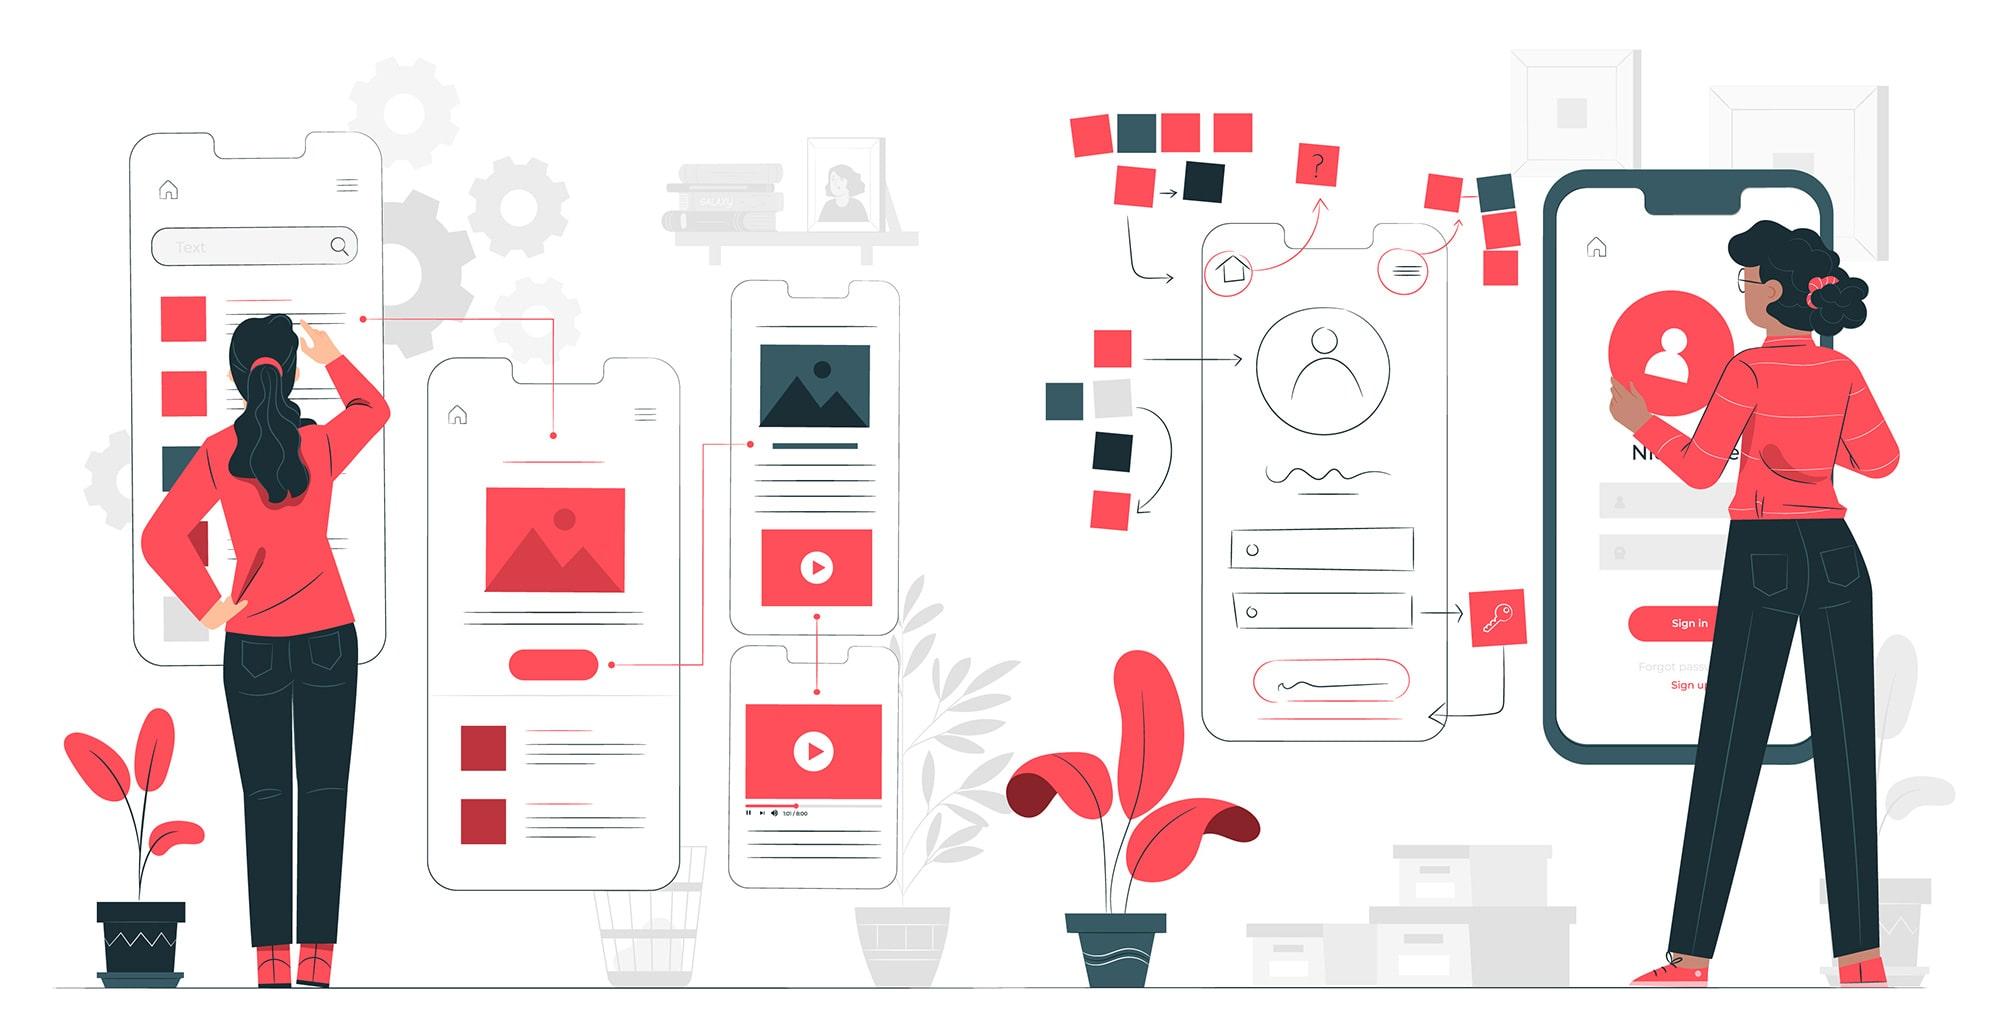 UI/UX Design Agency